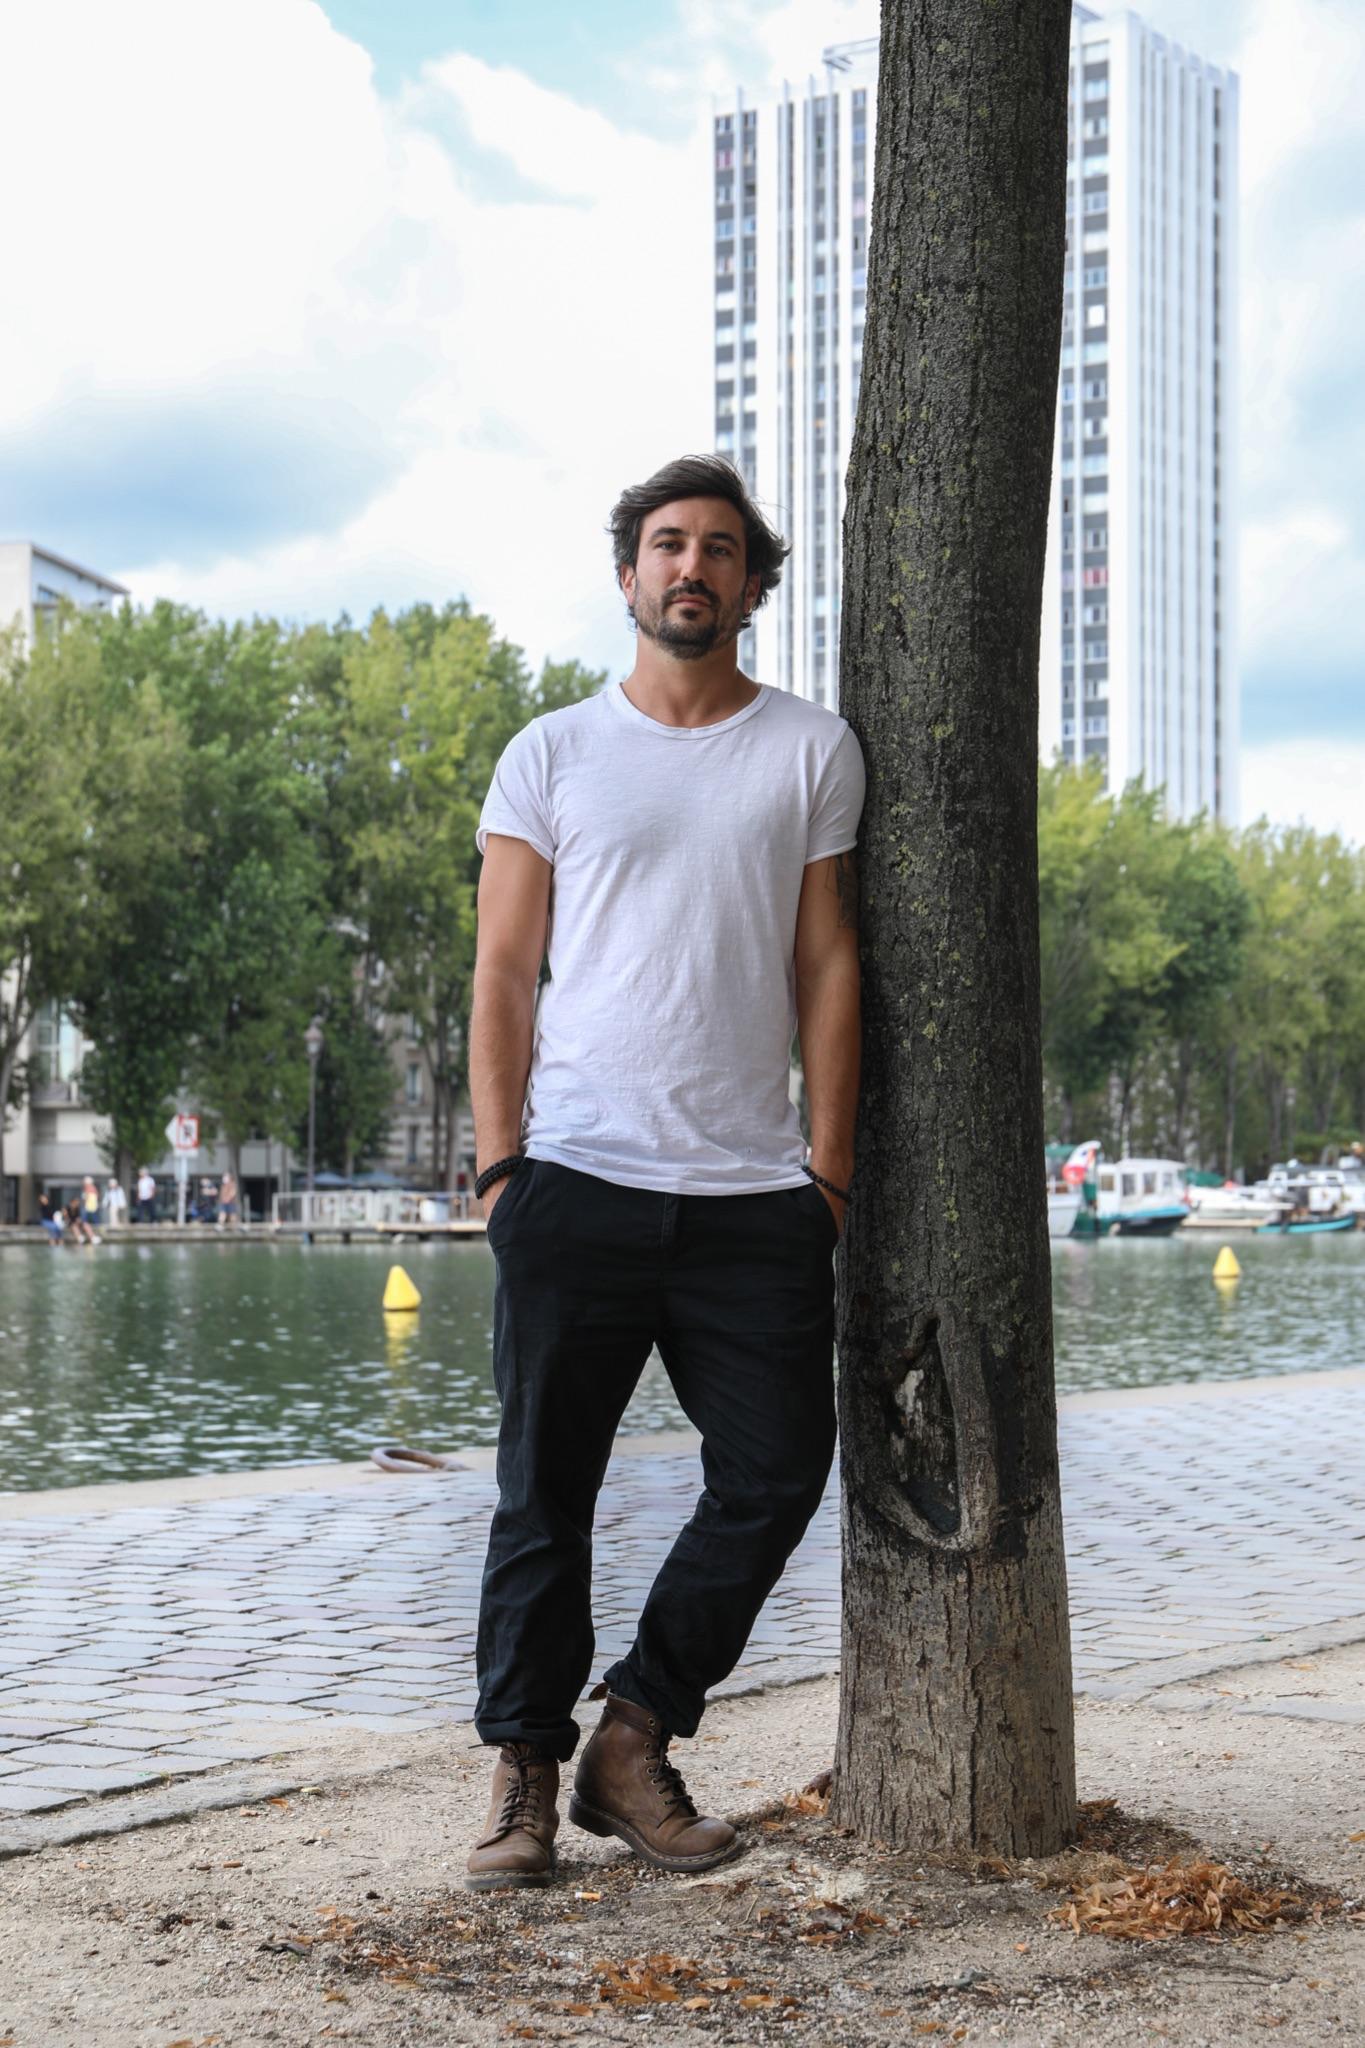 Yann Leymarie de l'association surfrider